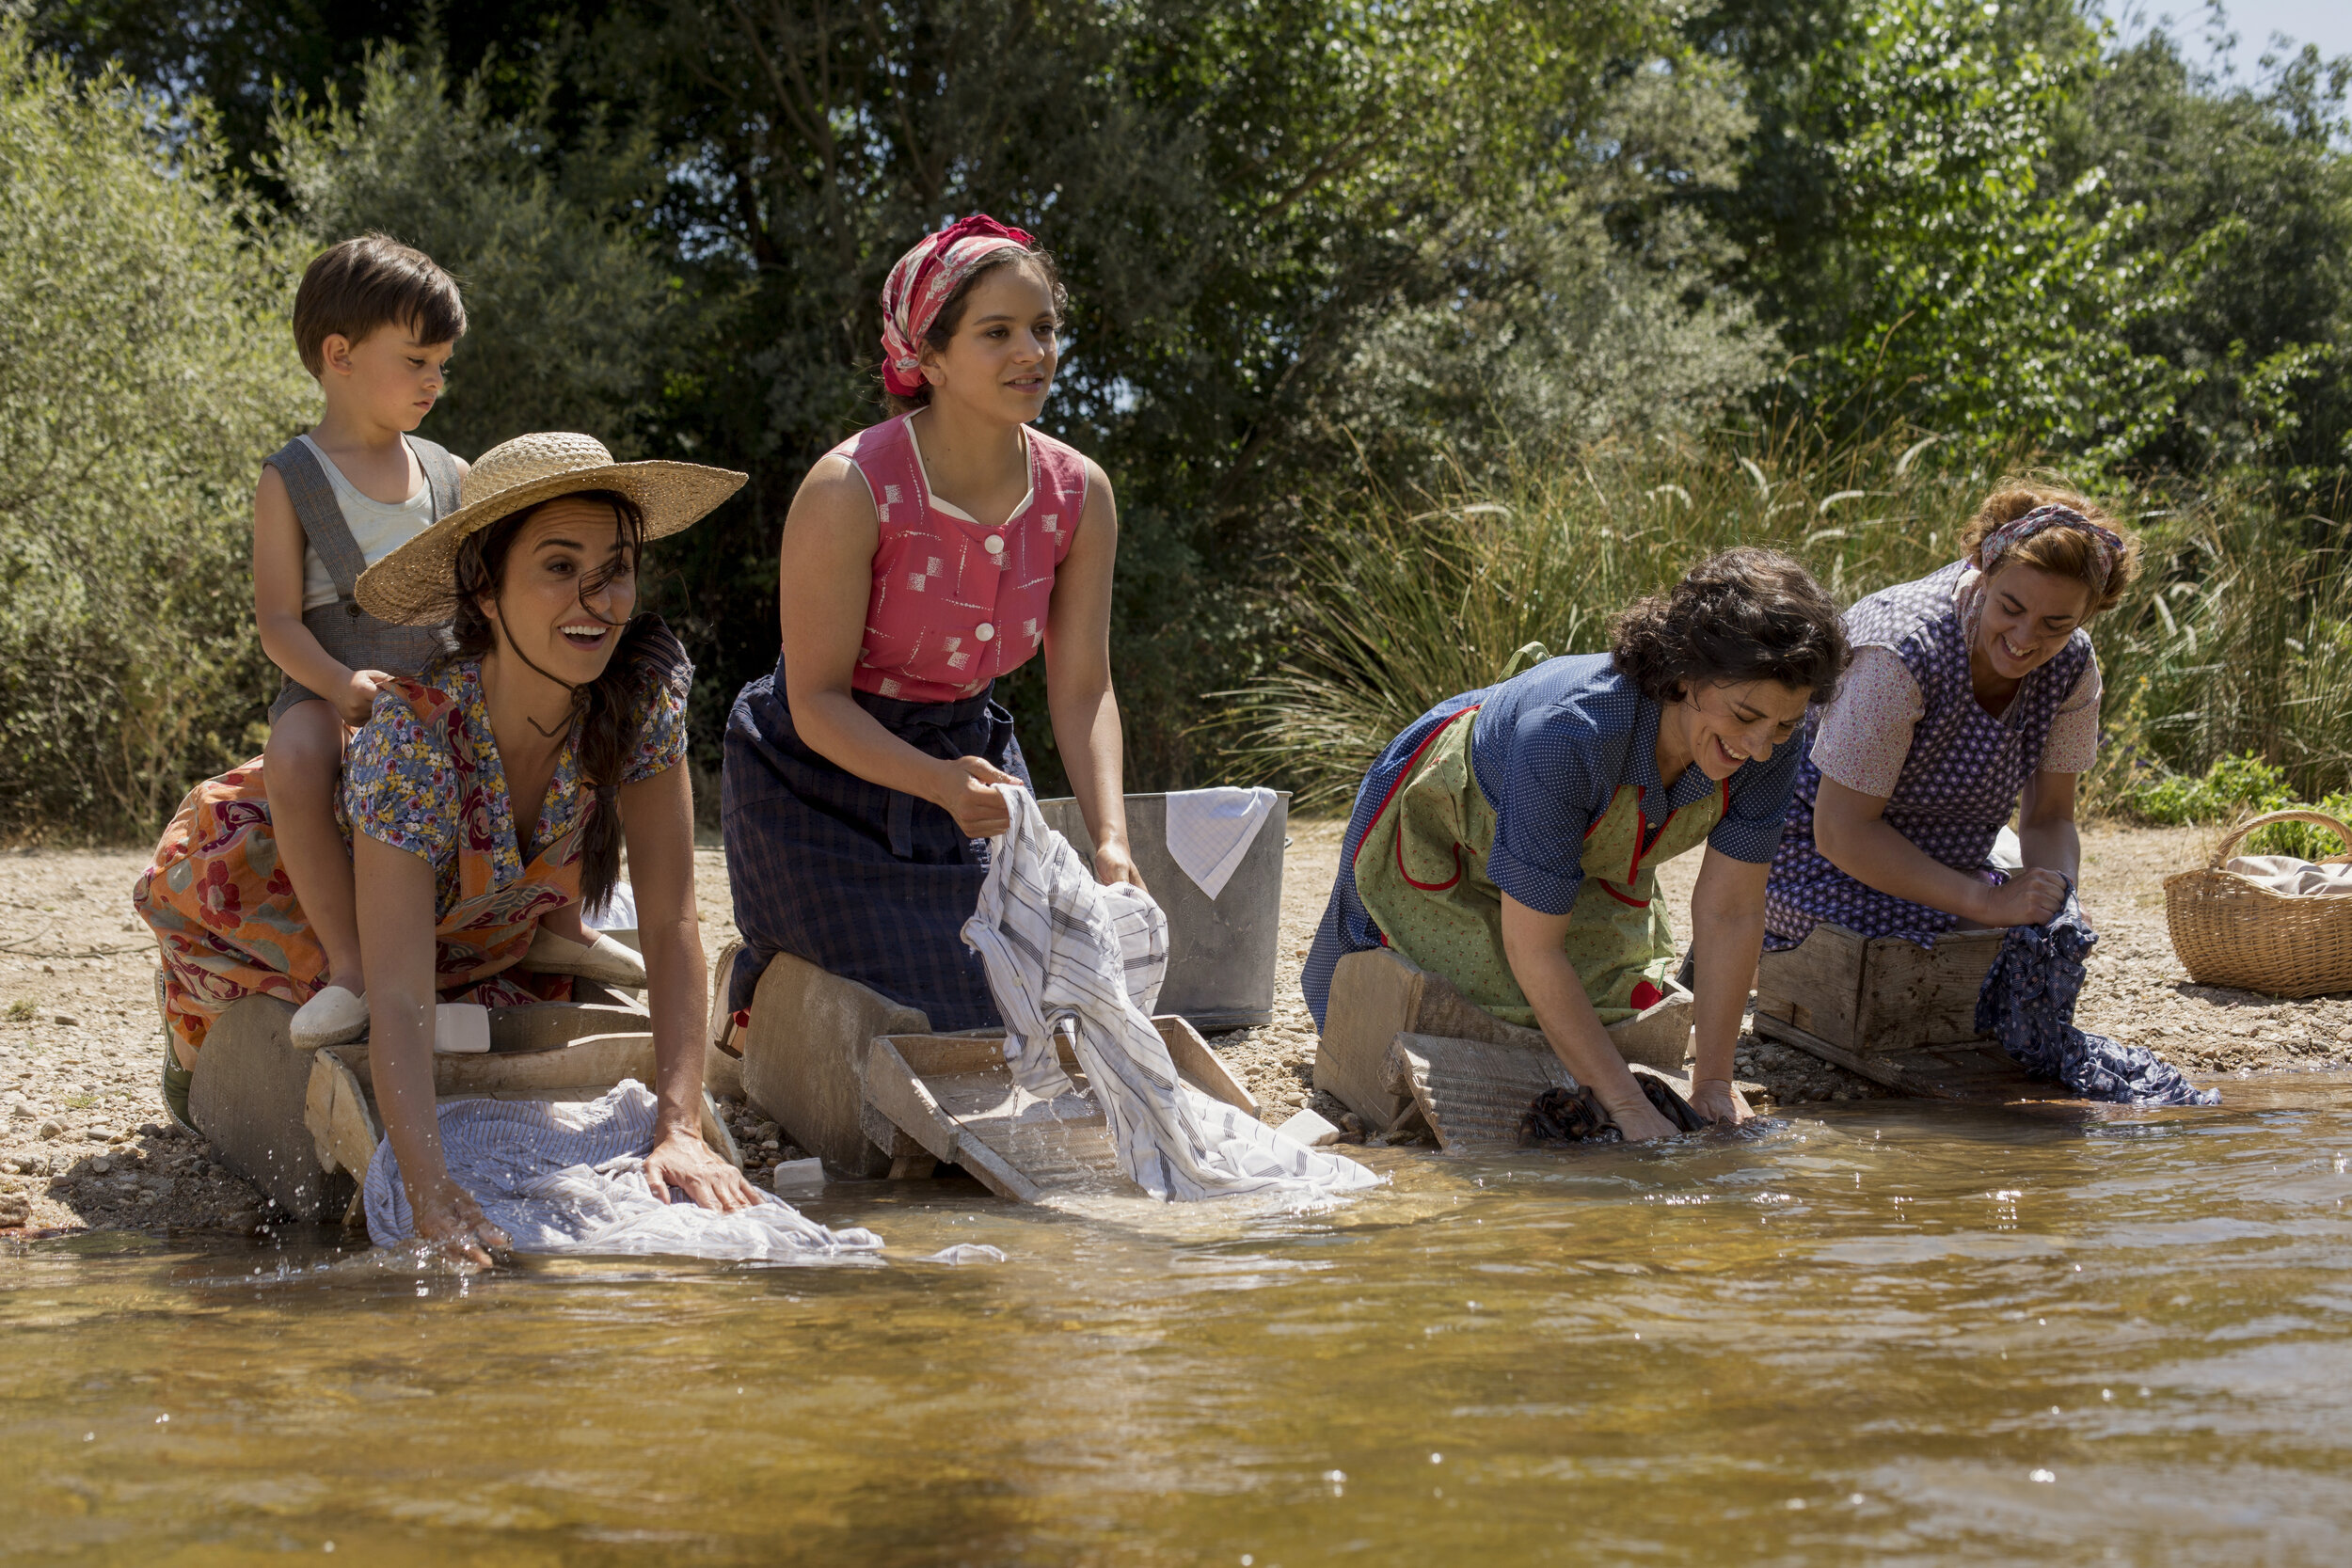 Salvador som smågutt på mammas rygg (Penélope Cruz) der hun og de andre landsbykvinnene vasker klær i elven.